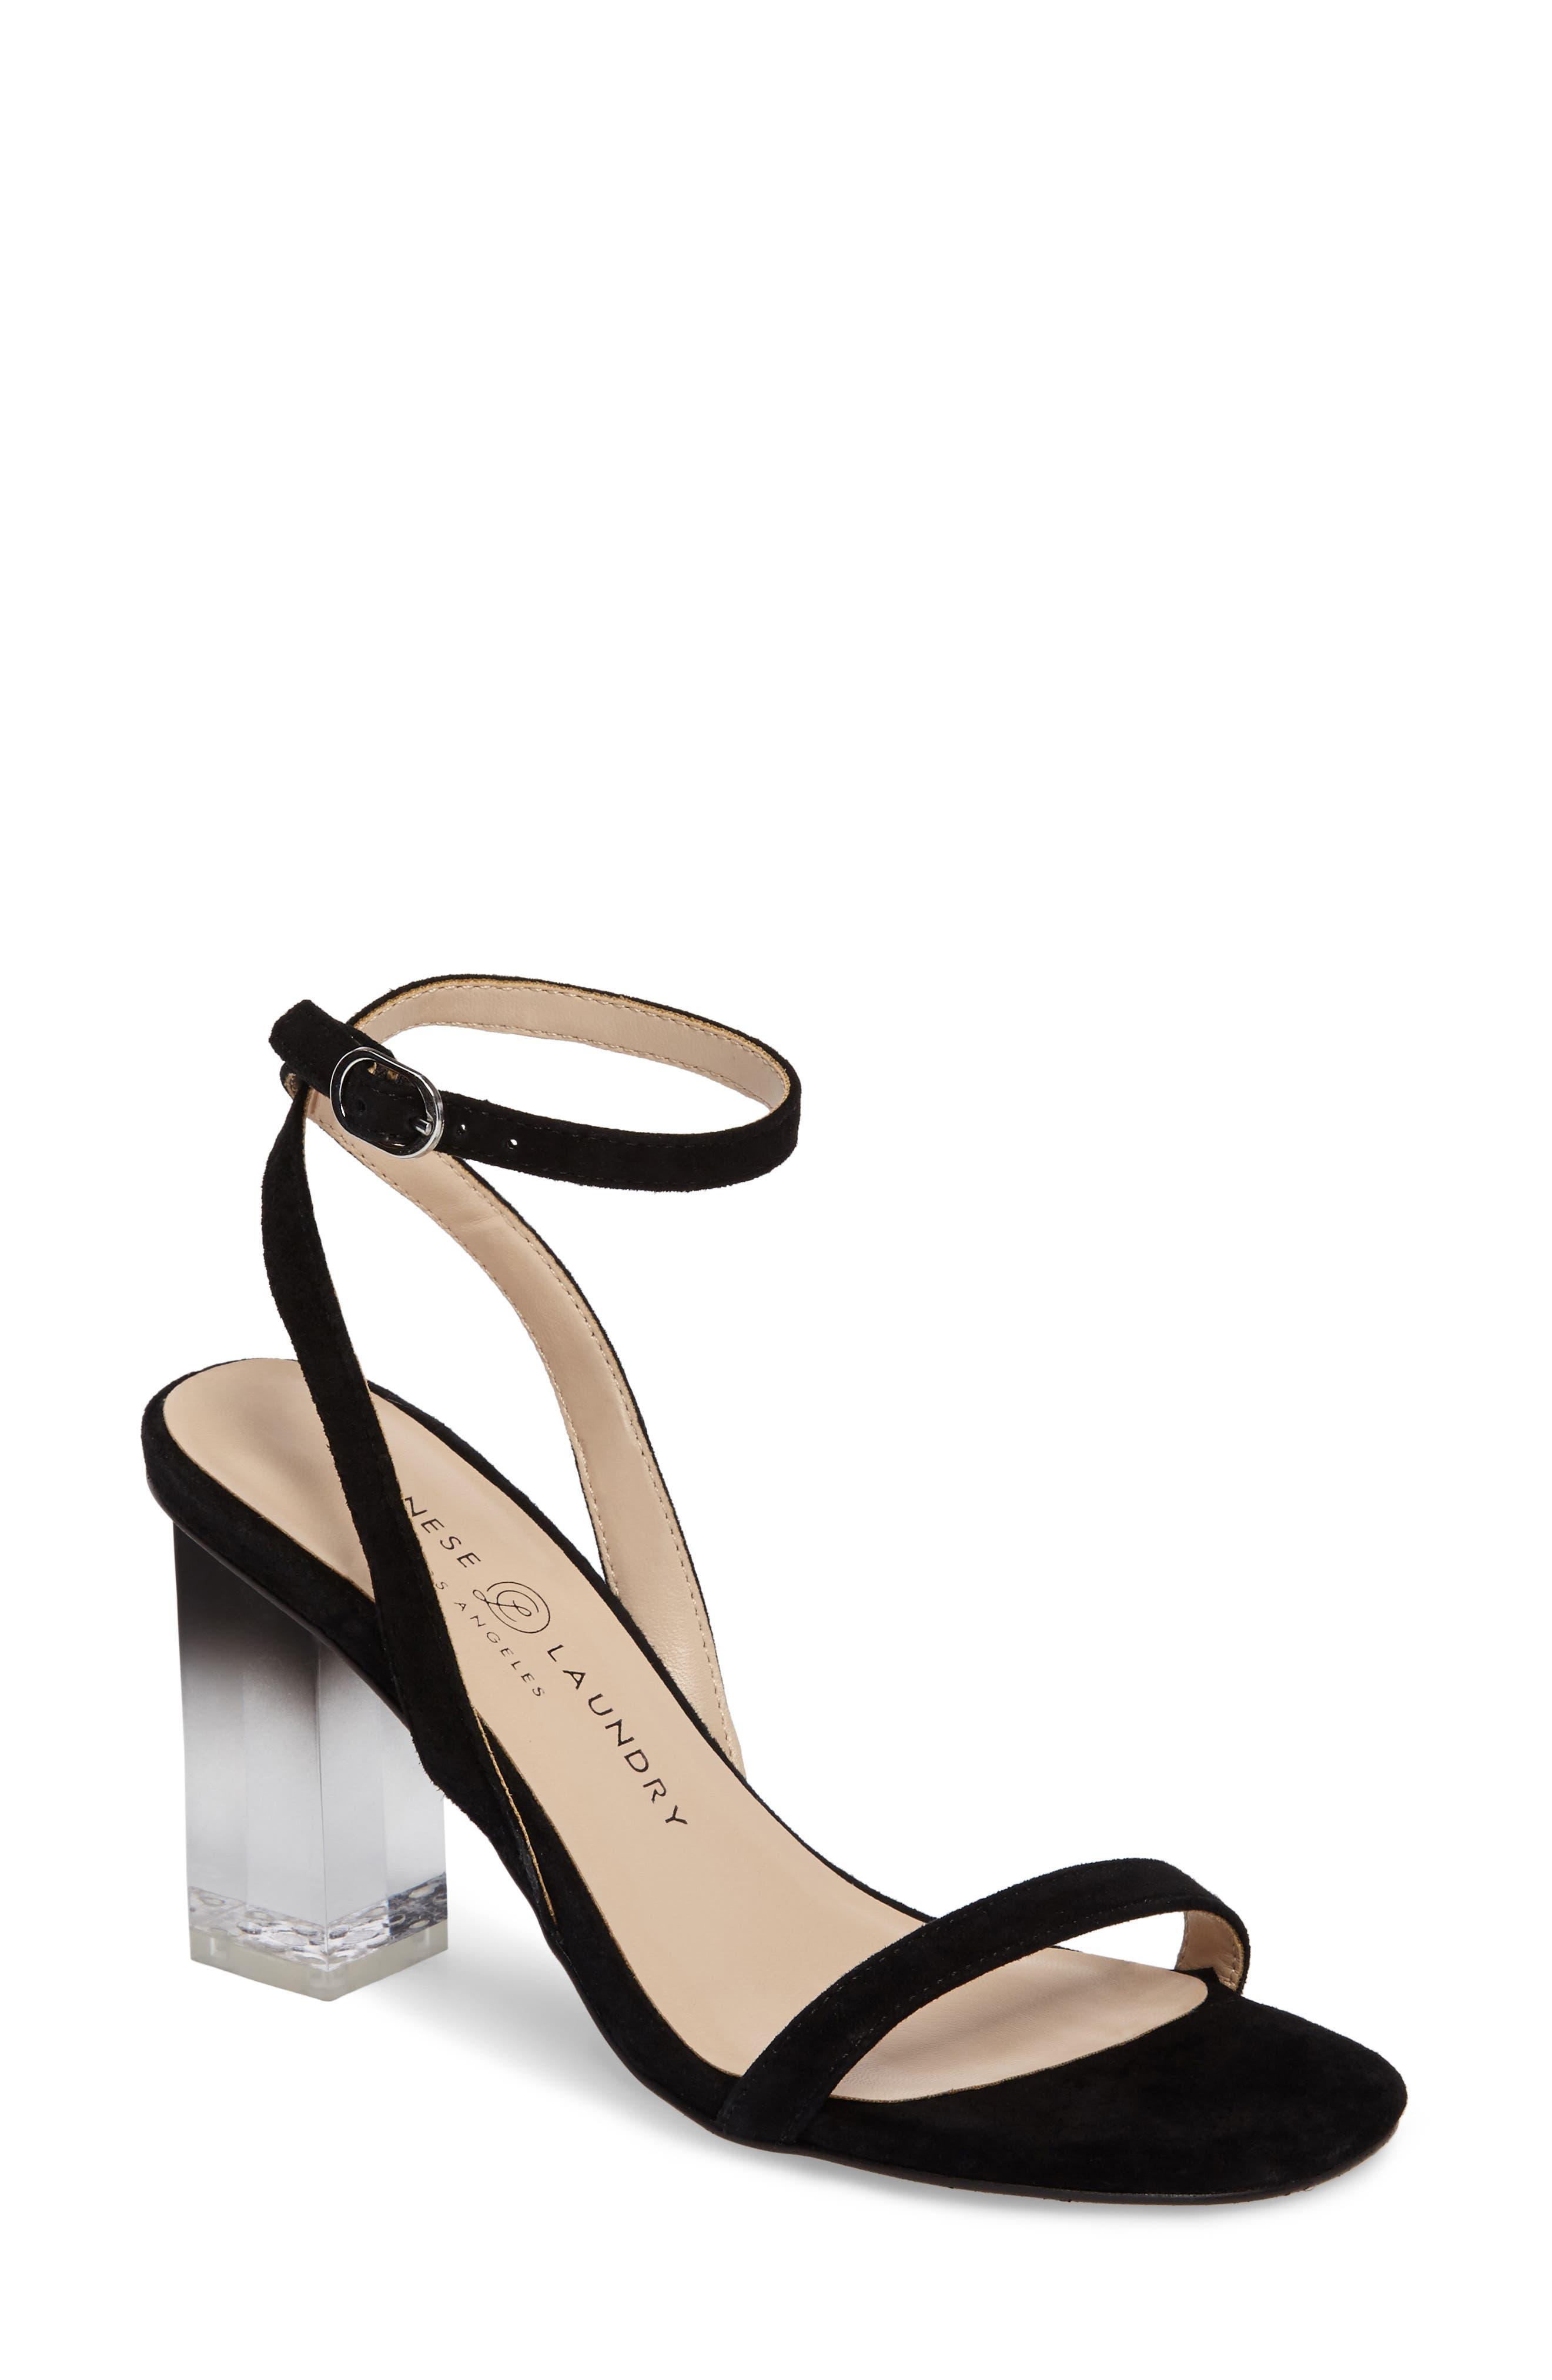 Shanie Clear Heel Sandal,                             Main thumbnail 1, color,                             001